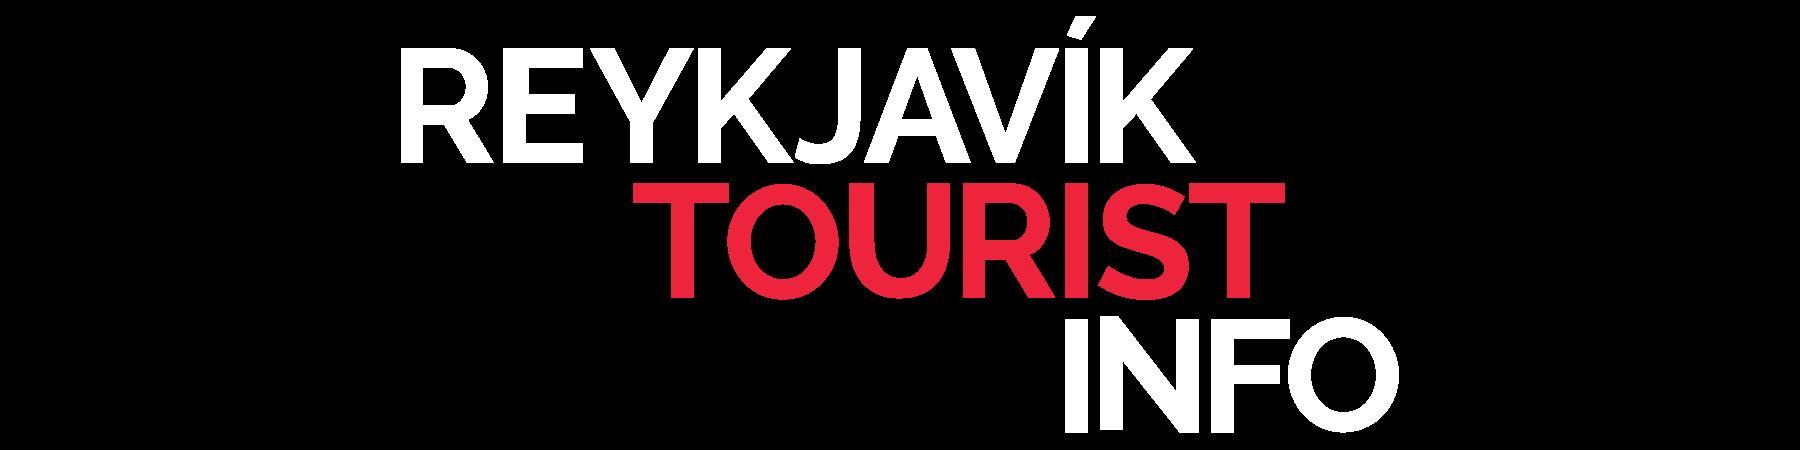 logo-4-dark